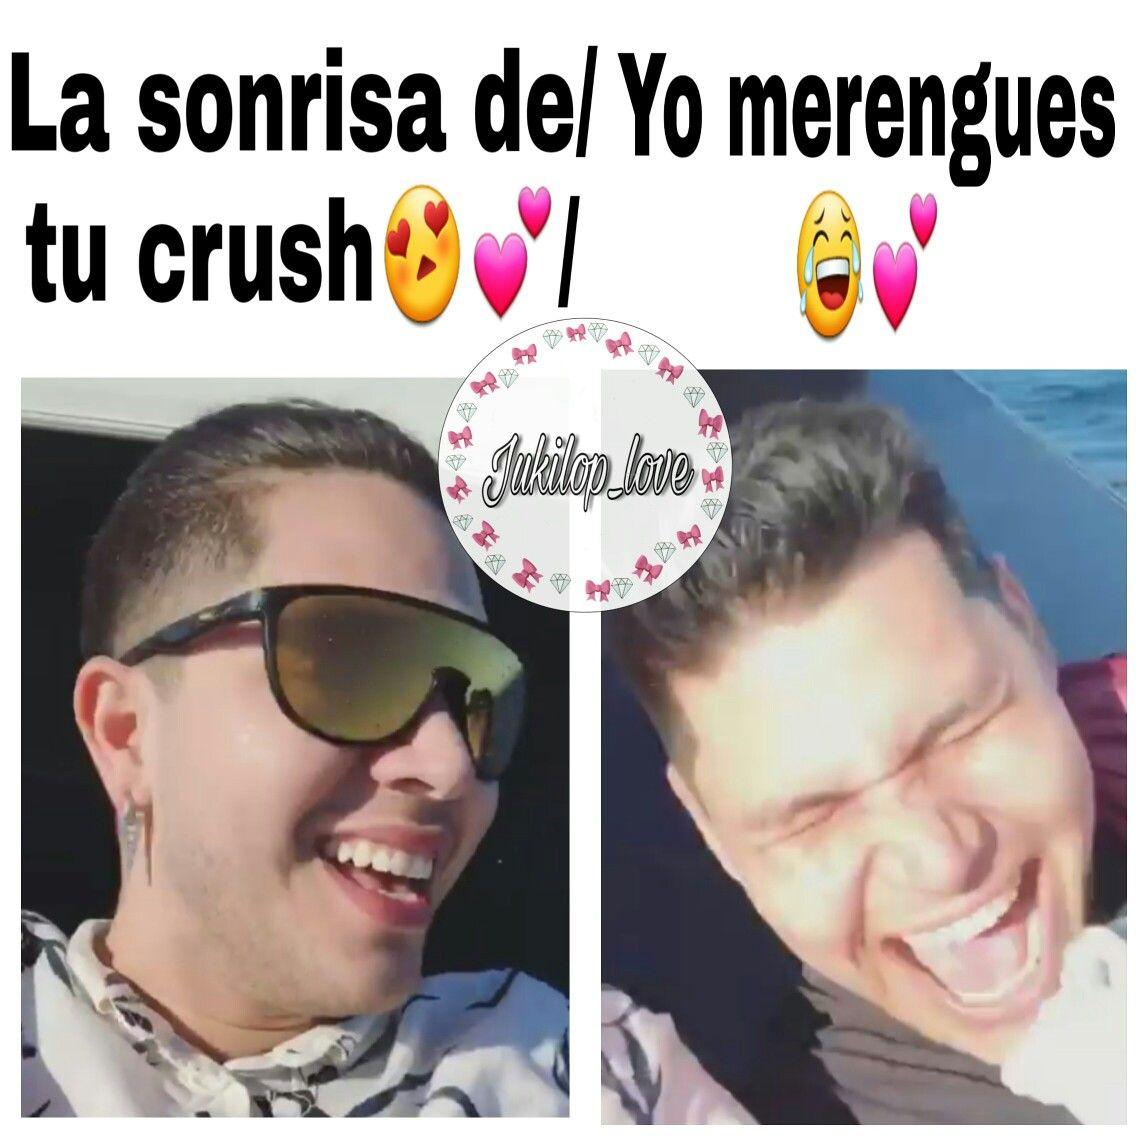 Meme Juan Y Supertrucha Ig Jukilop Love16 Memes De Juan Memes Divertidos Memes Gracioso